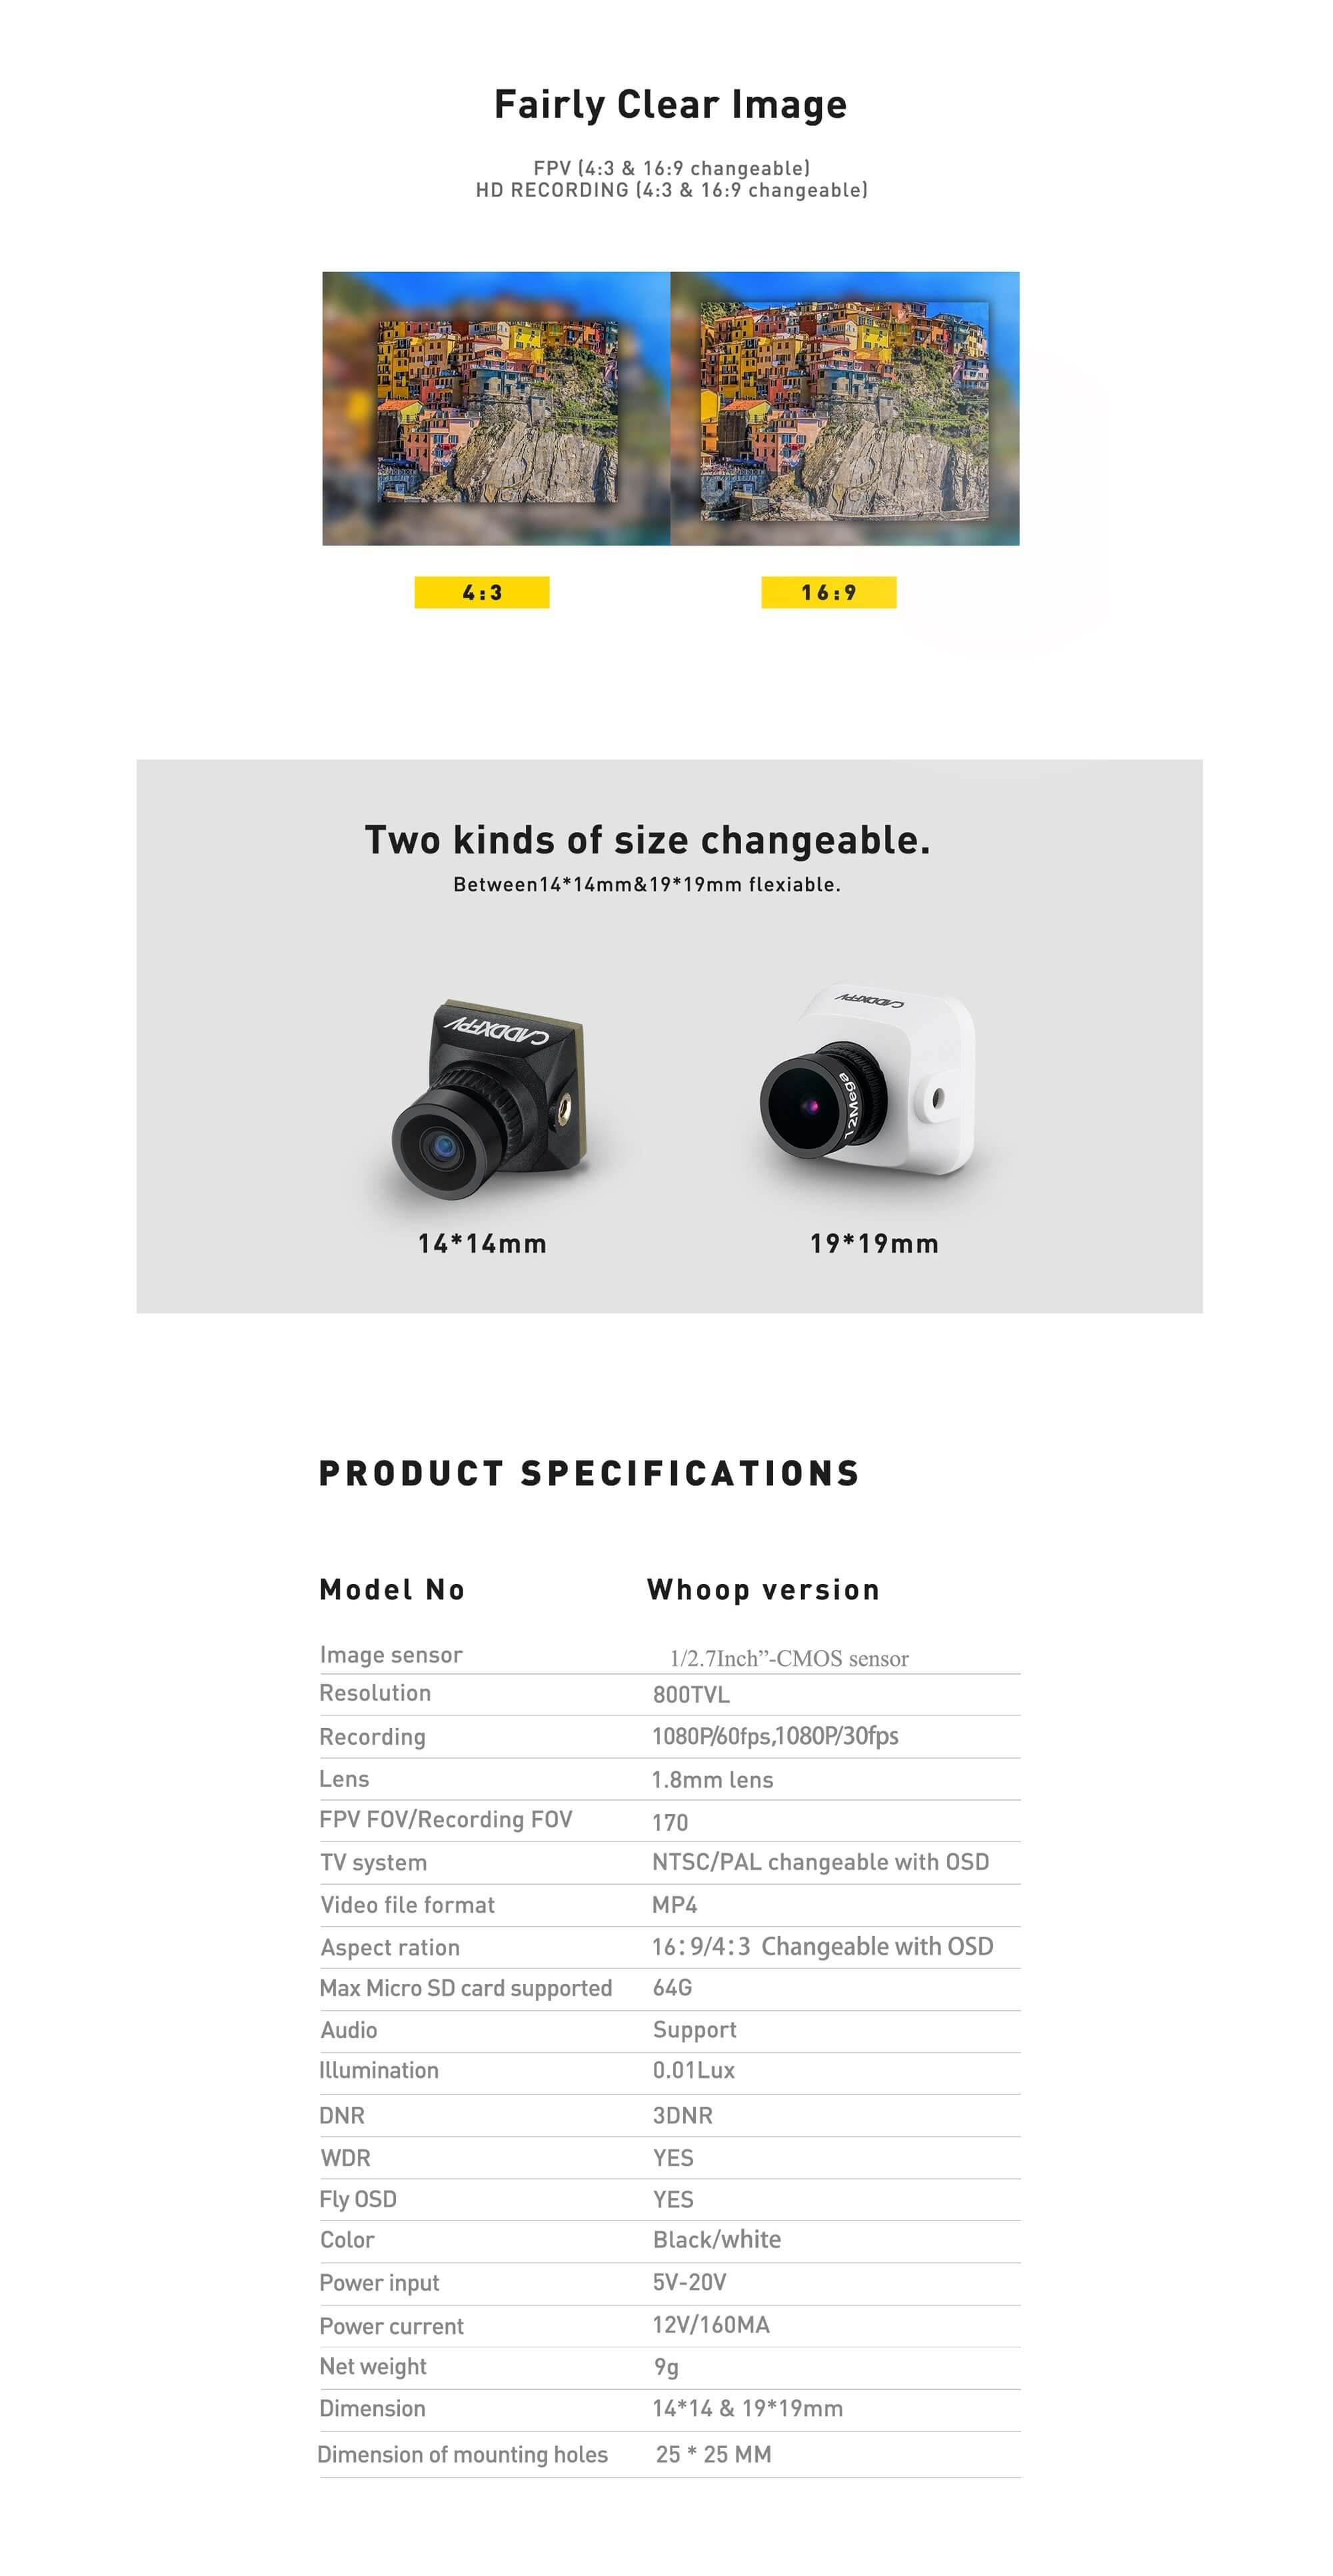 Specyfikacja kamery Caddx Baby Turtle Whoop